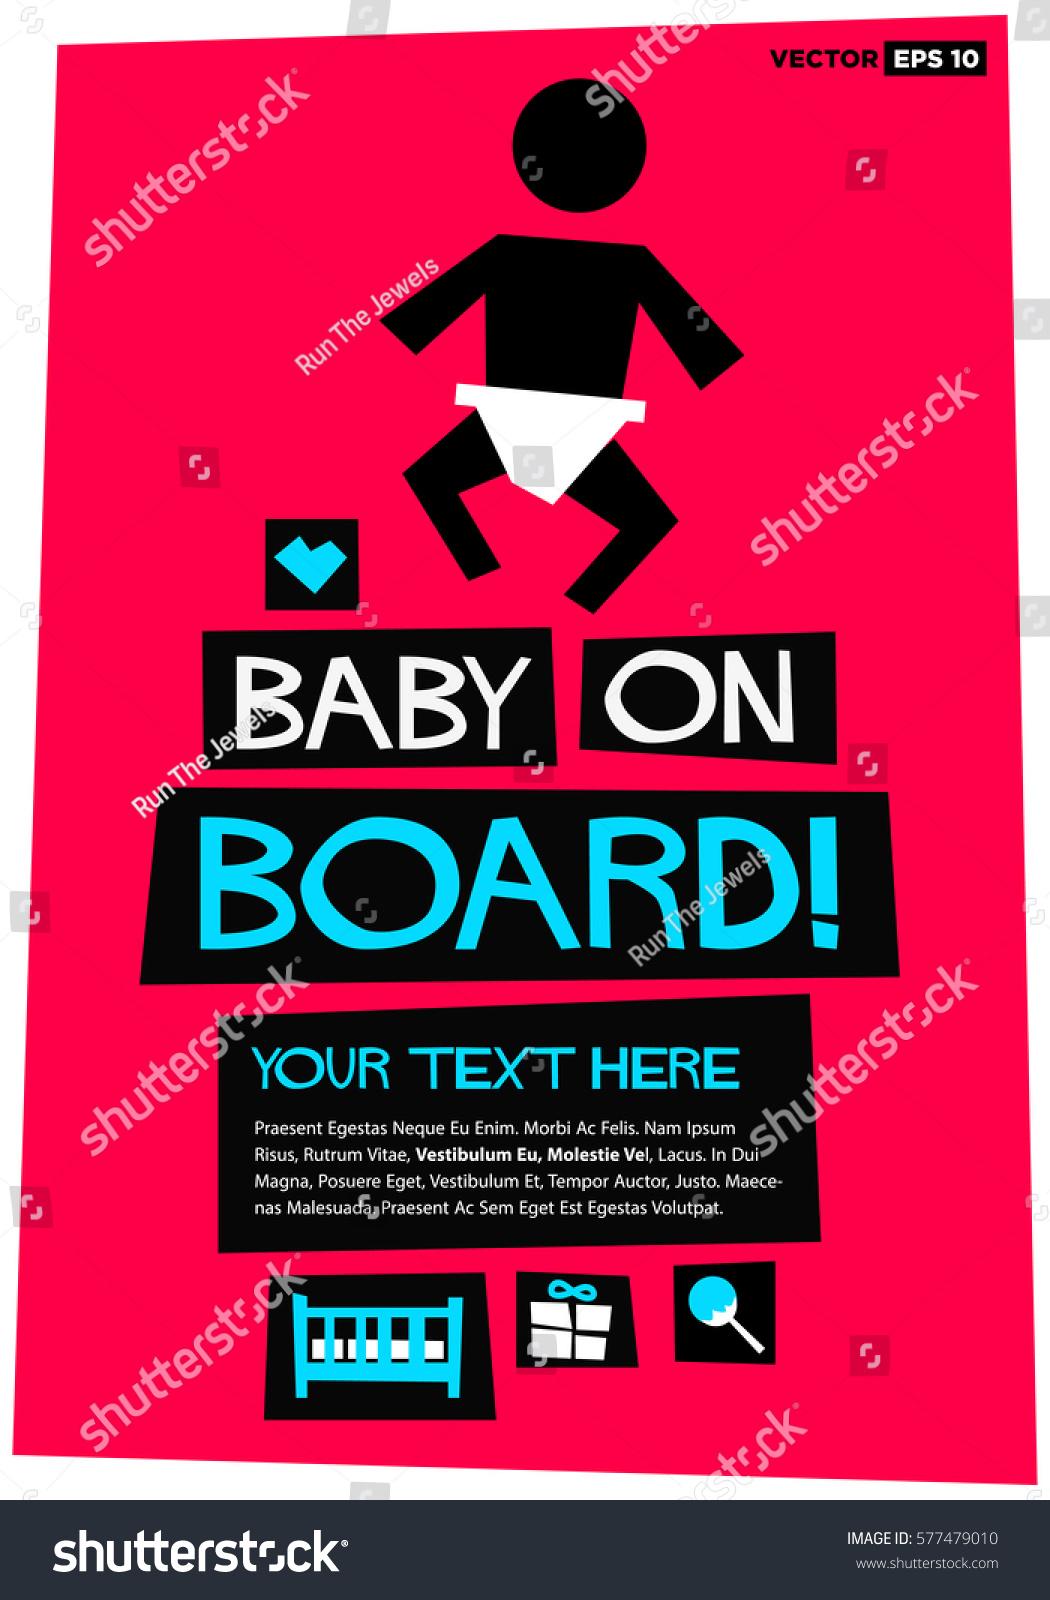 Baby On Board Flat Style Vector Stock Vector 577479010 - Shutterstock